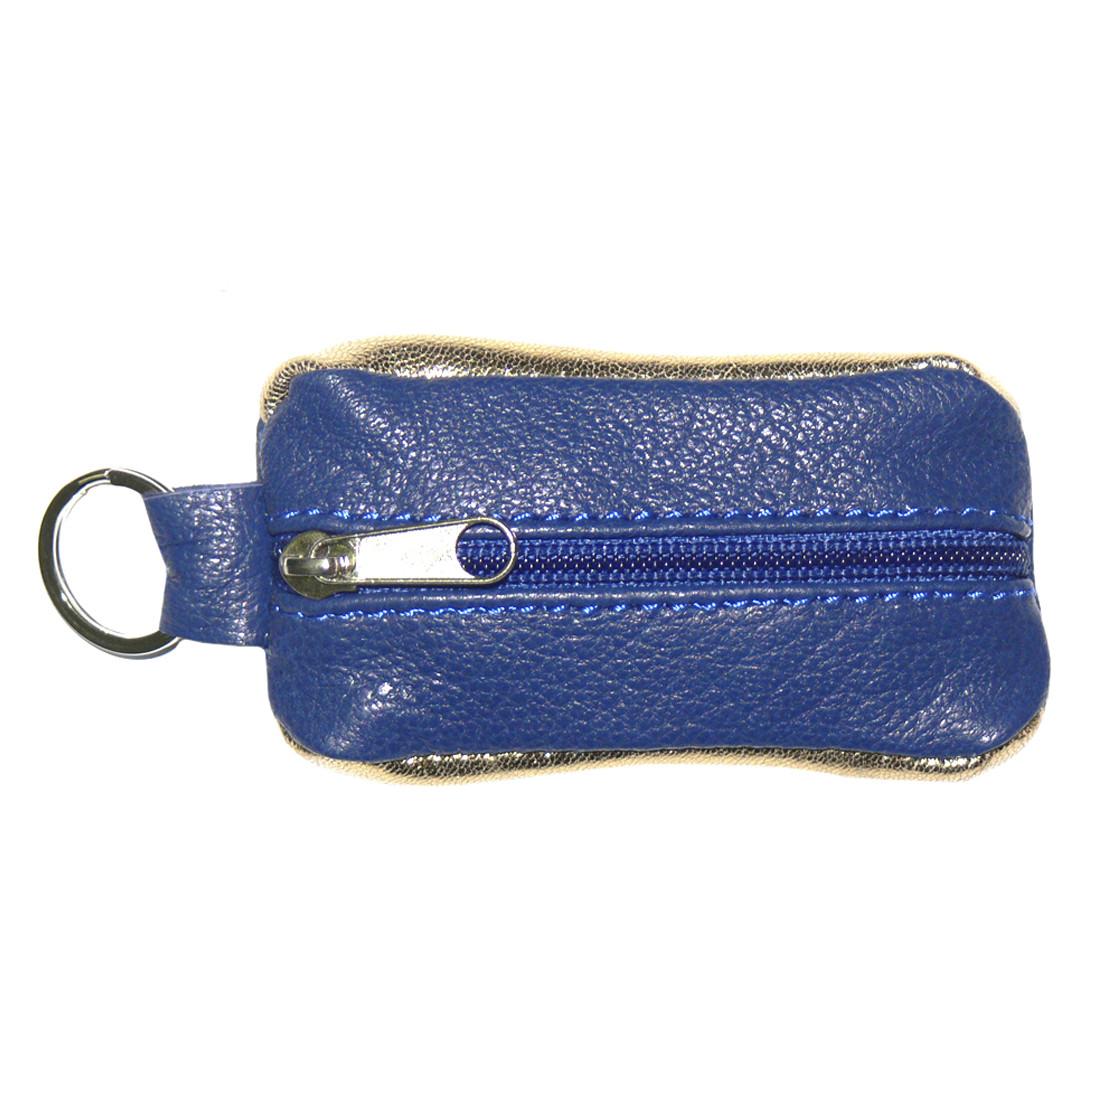 Ключница-футляр синяя BagHouse из натуральной кожи 7,5х4 см  фф7син